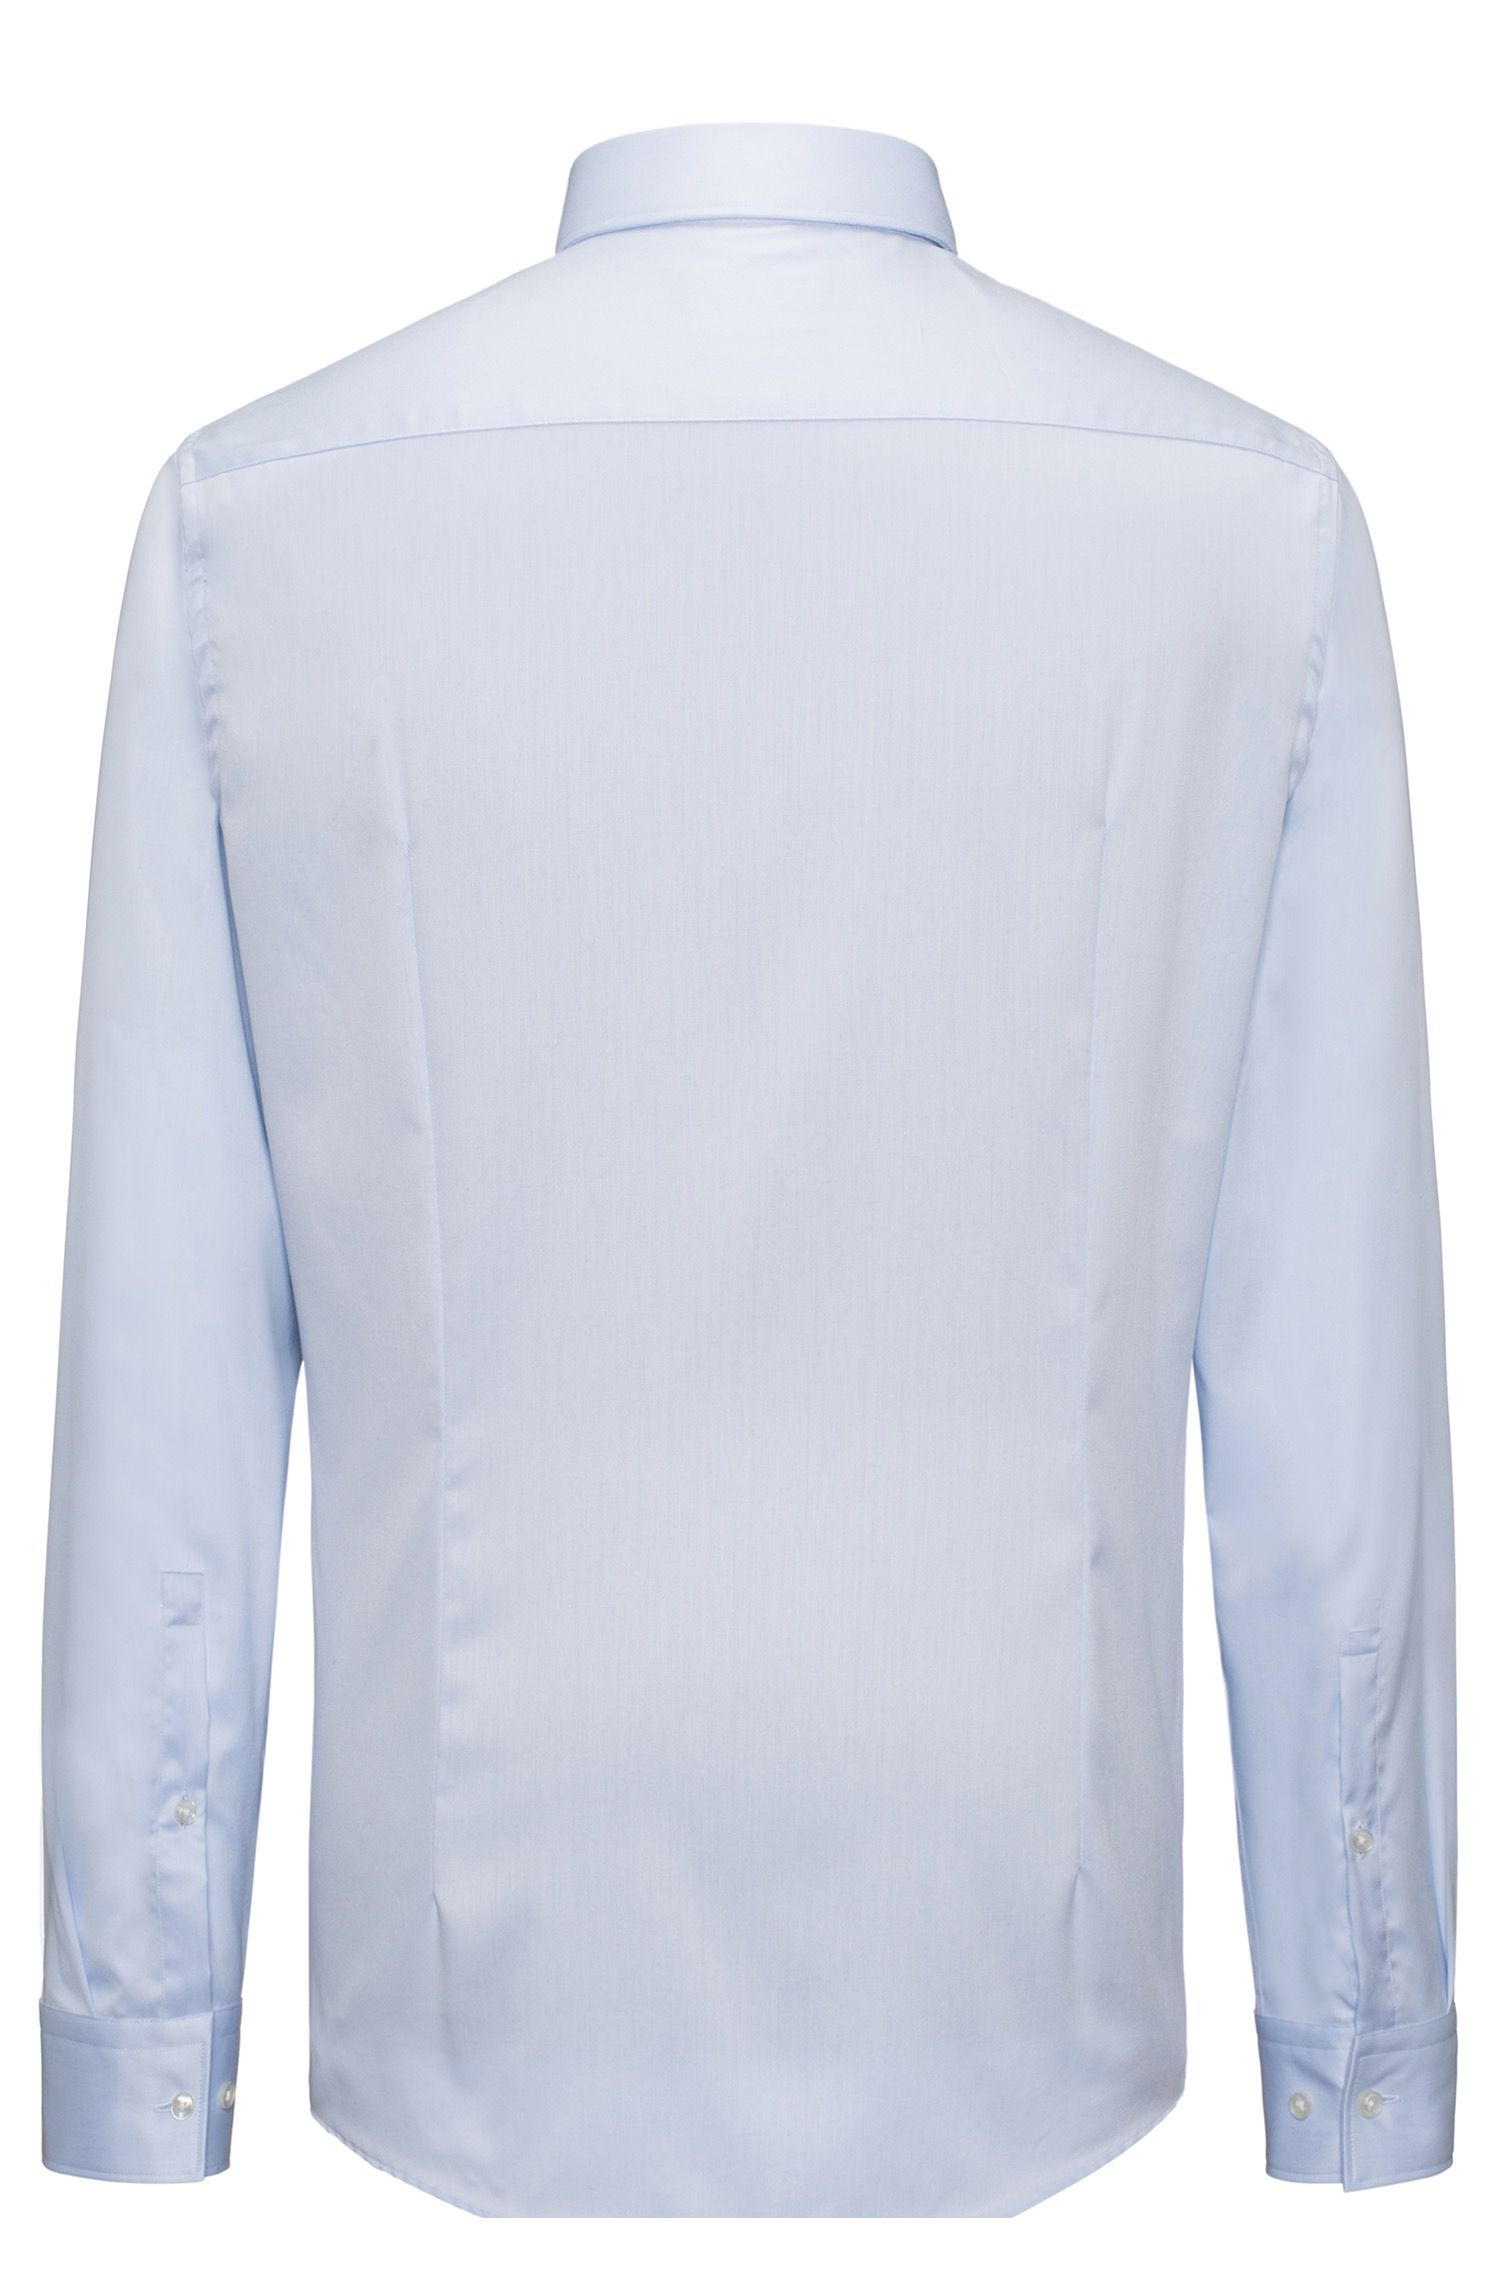 Camicia a maniche lunghe in twill di cotone